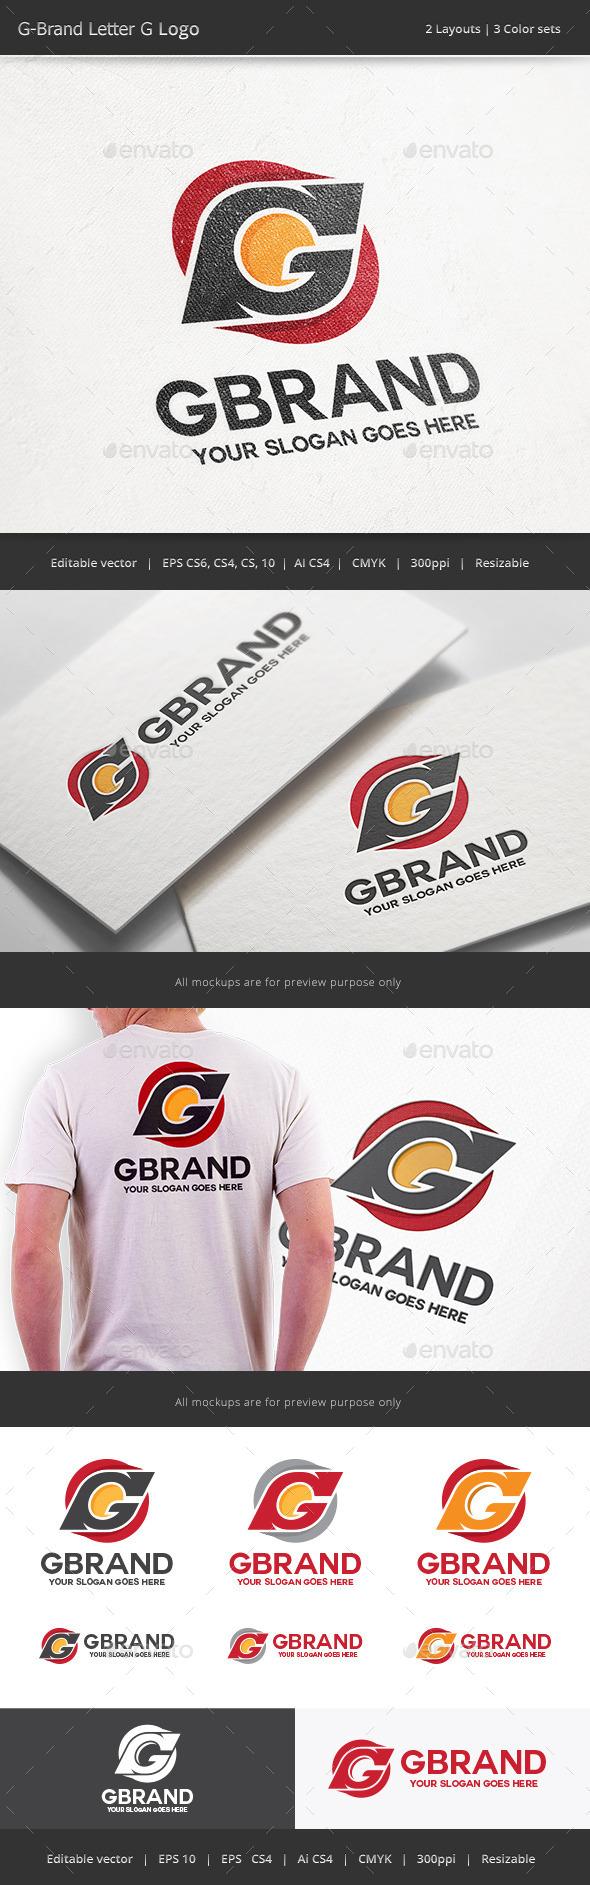 GraphicRiver G Brand Letter G Logo 10026721